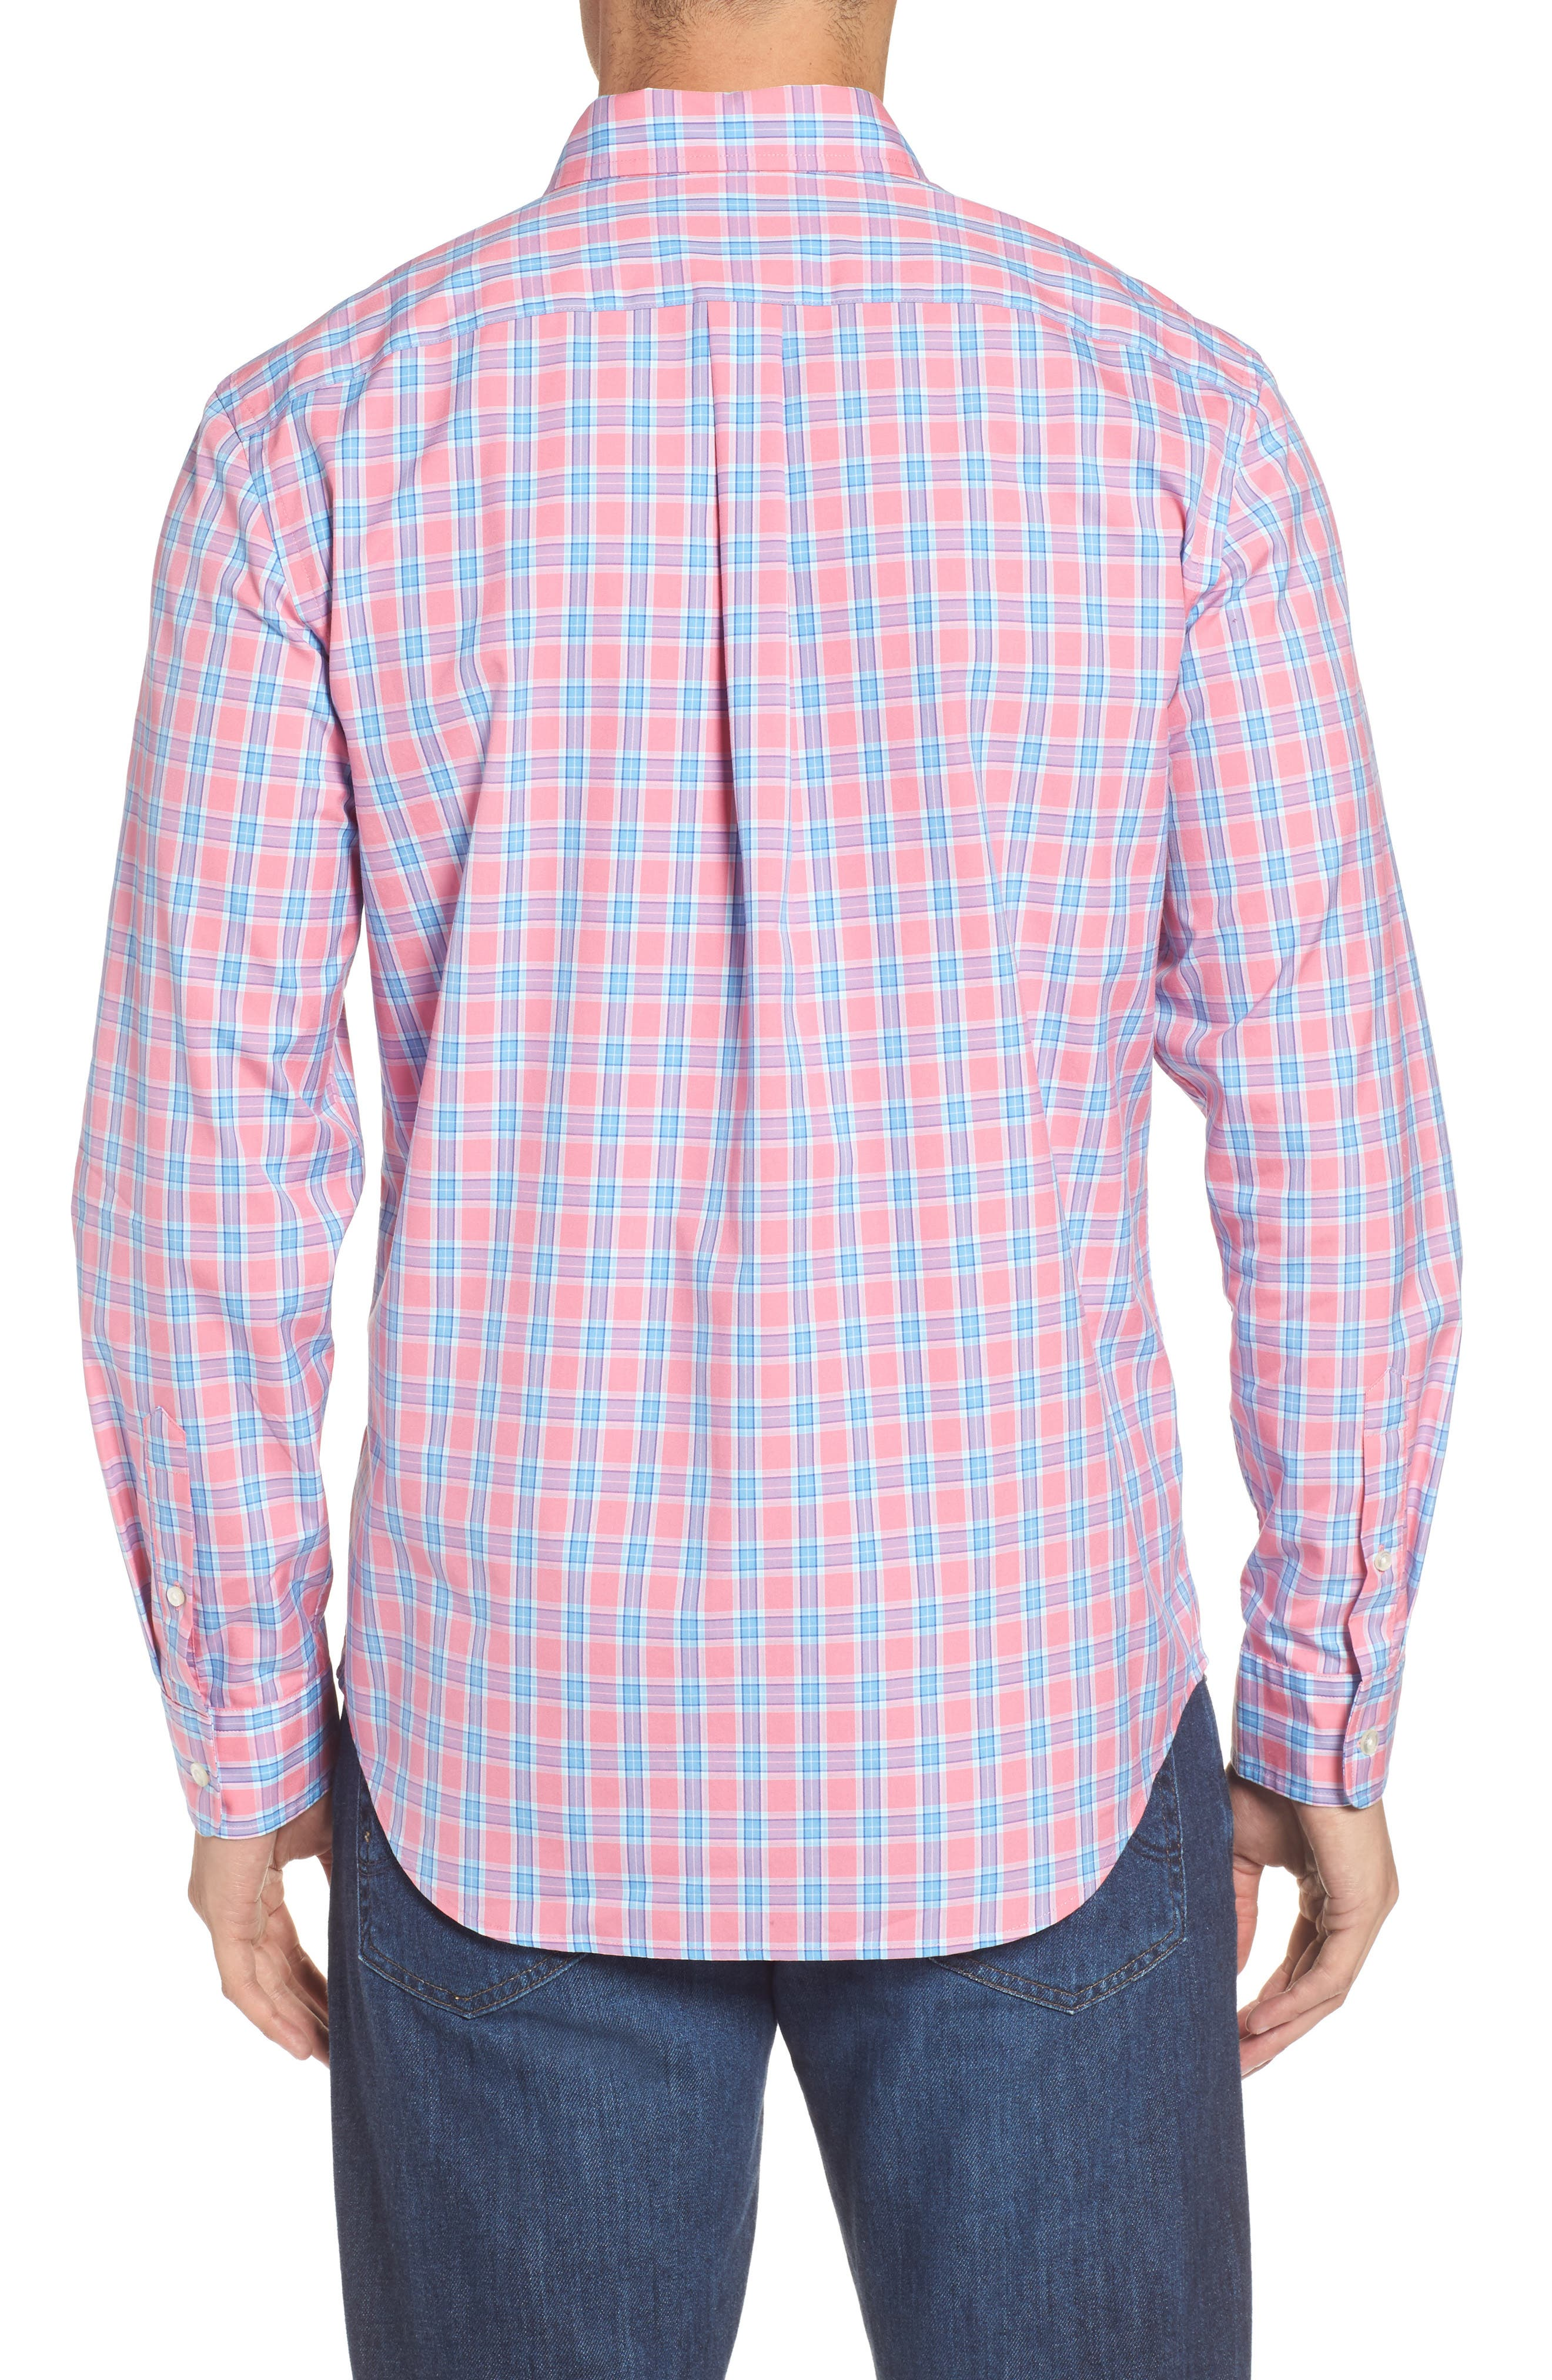 Tucker Bayard Classic Fit Plaid Sport Shirt,                             Alternate thumbnail 2, color,                             650